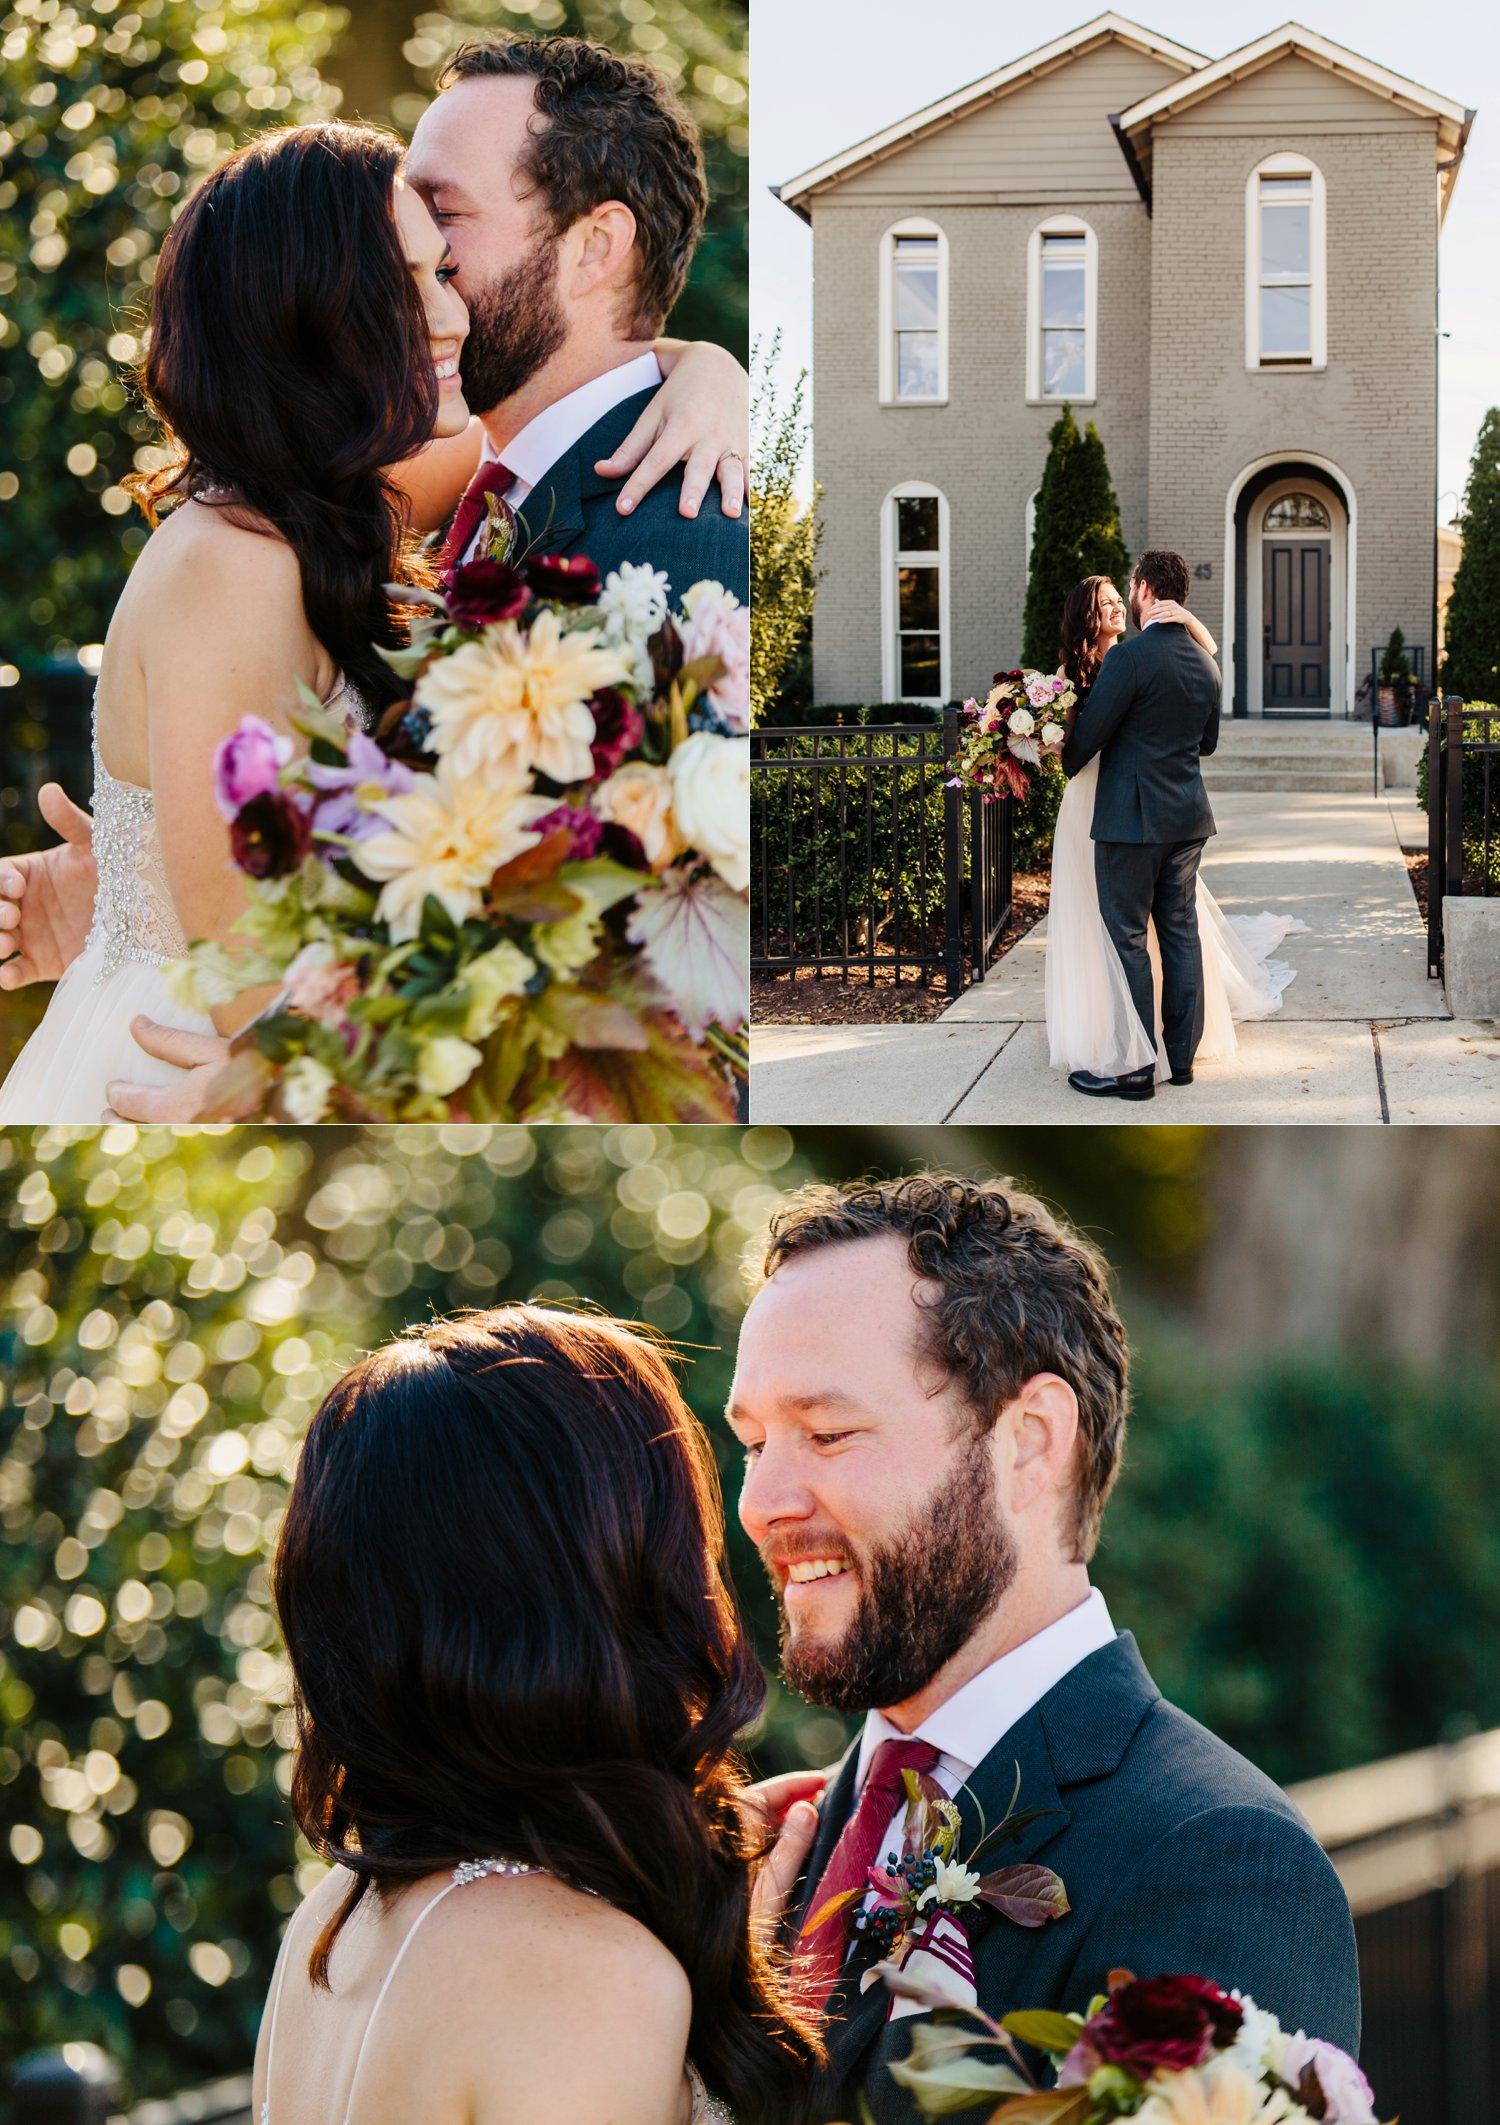 CK-Photo-Nashville-engagement-wedding-photographer-the-cordelle_0006.jpg